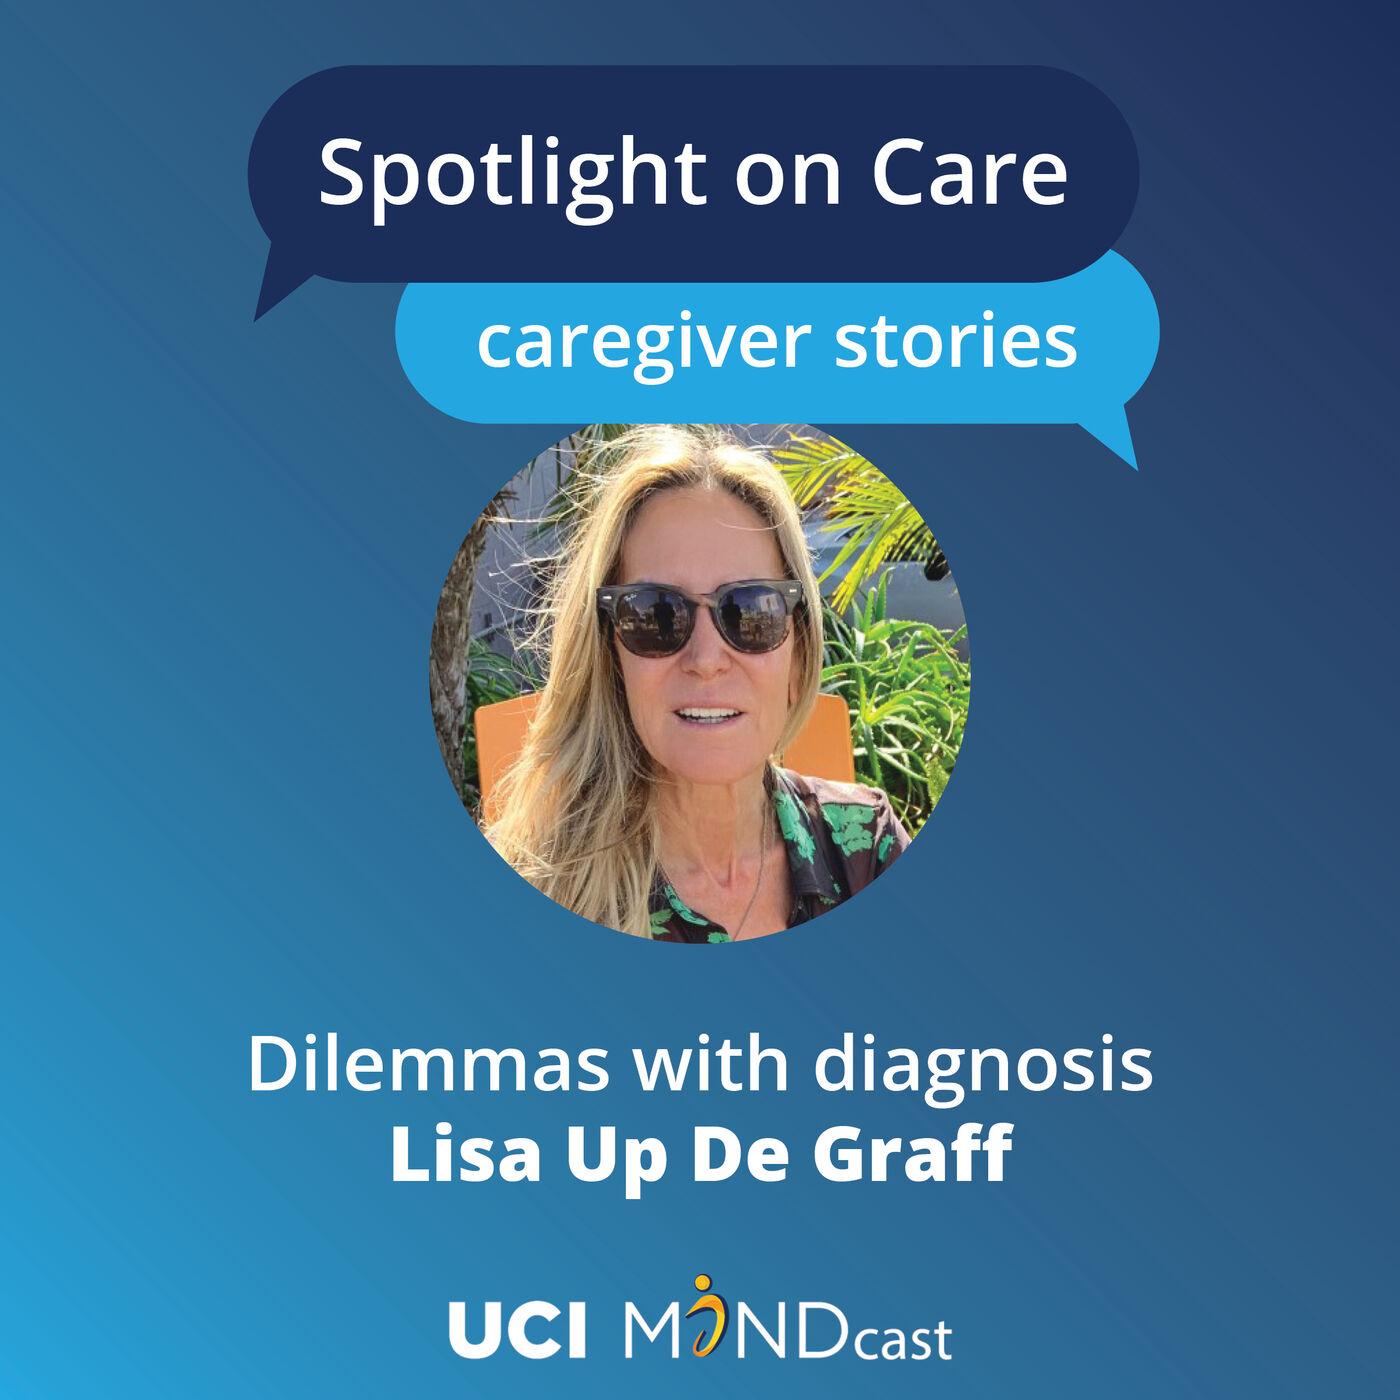 Dilemmas with Diagnosis with Lisa Up de Graff